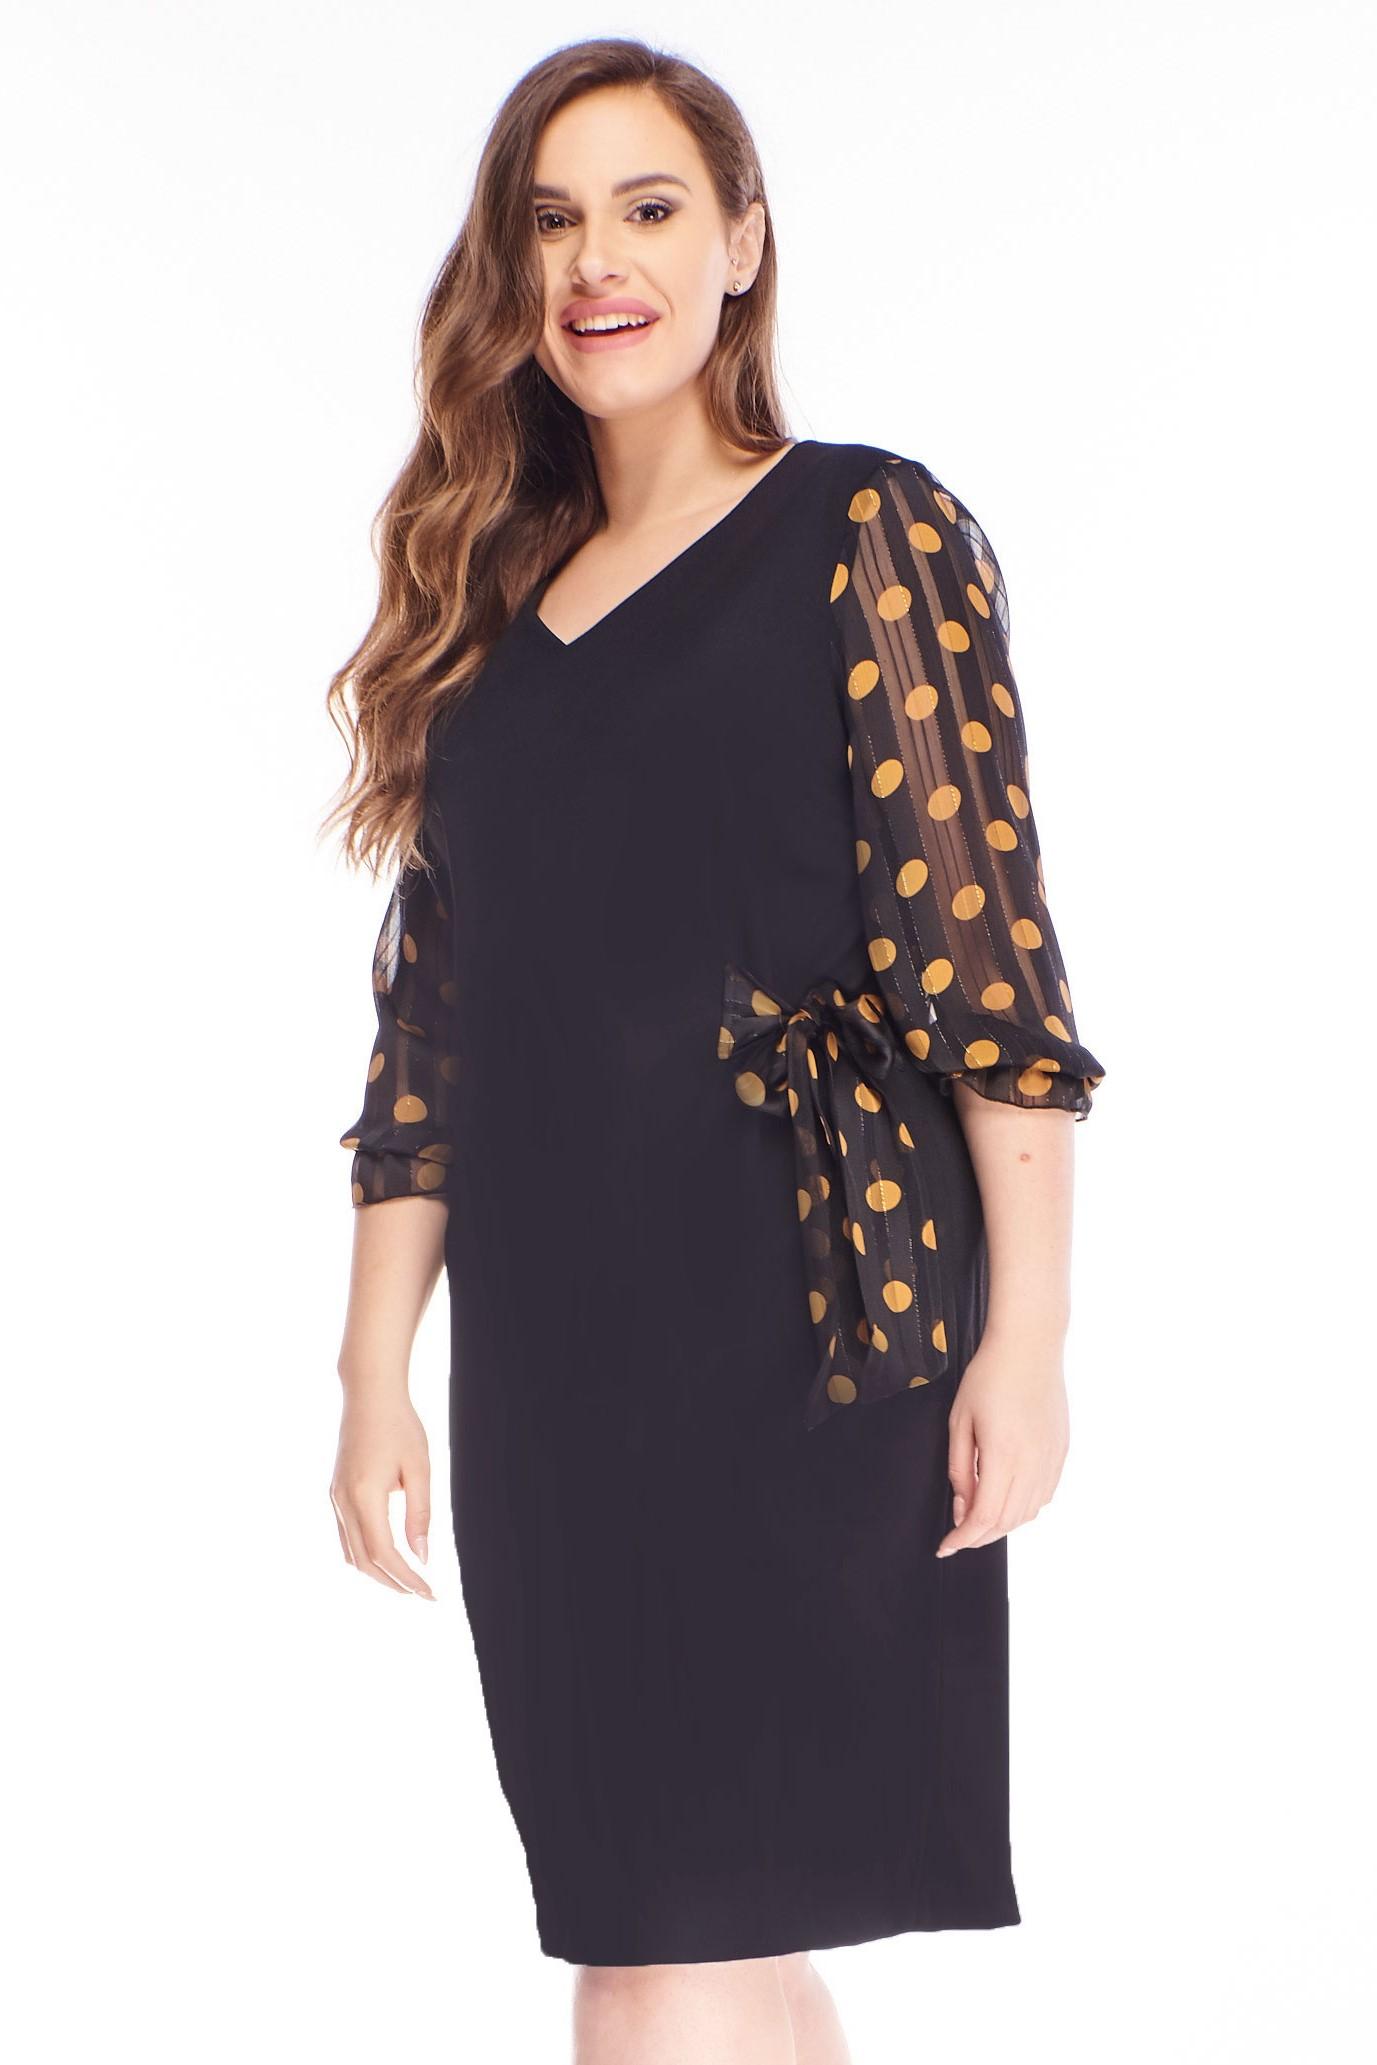 Čierne krátke šaty s horčicovými bodkovanými rukávmi - 38